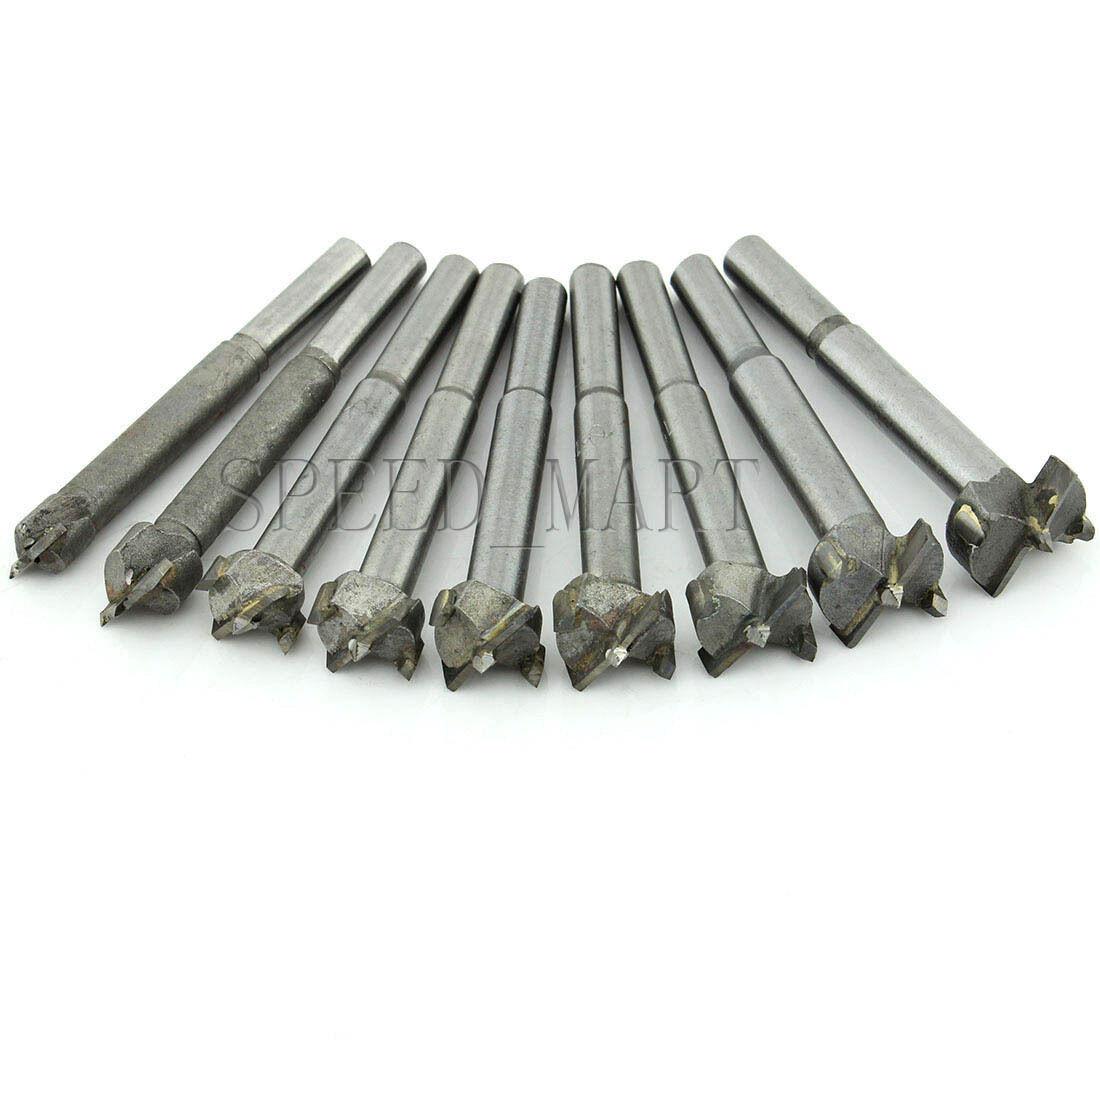 19mm Forstner Woodwork Boring Wood Hole Saw Cutter Drill Bit Hole Cutter